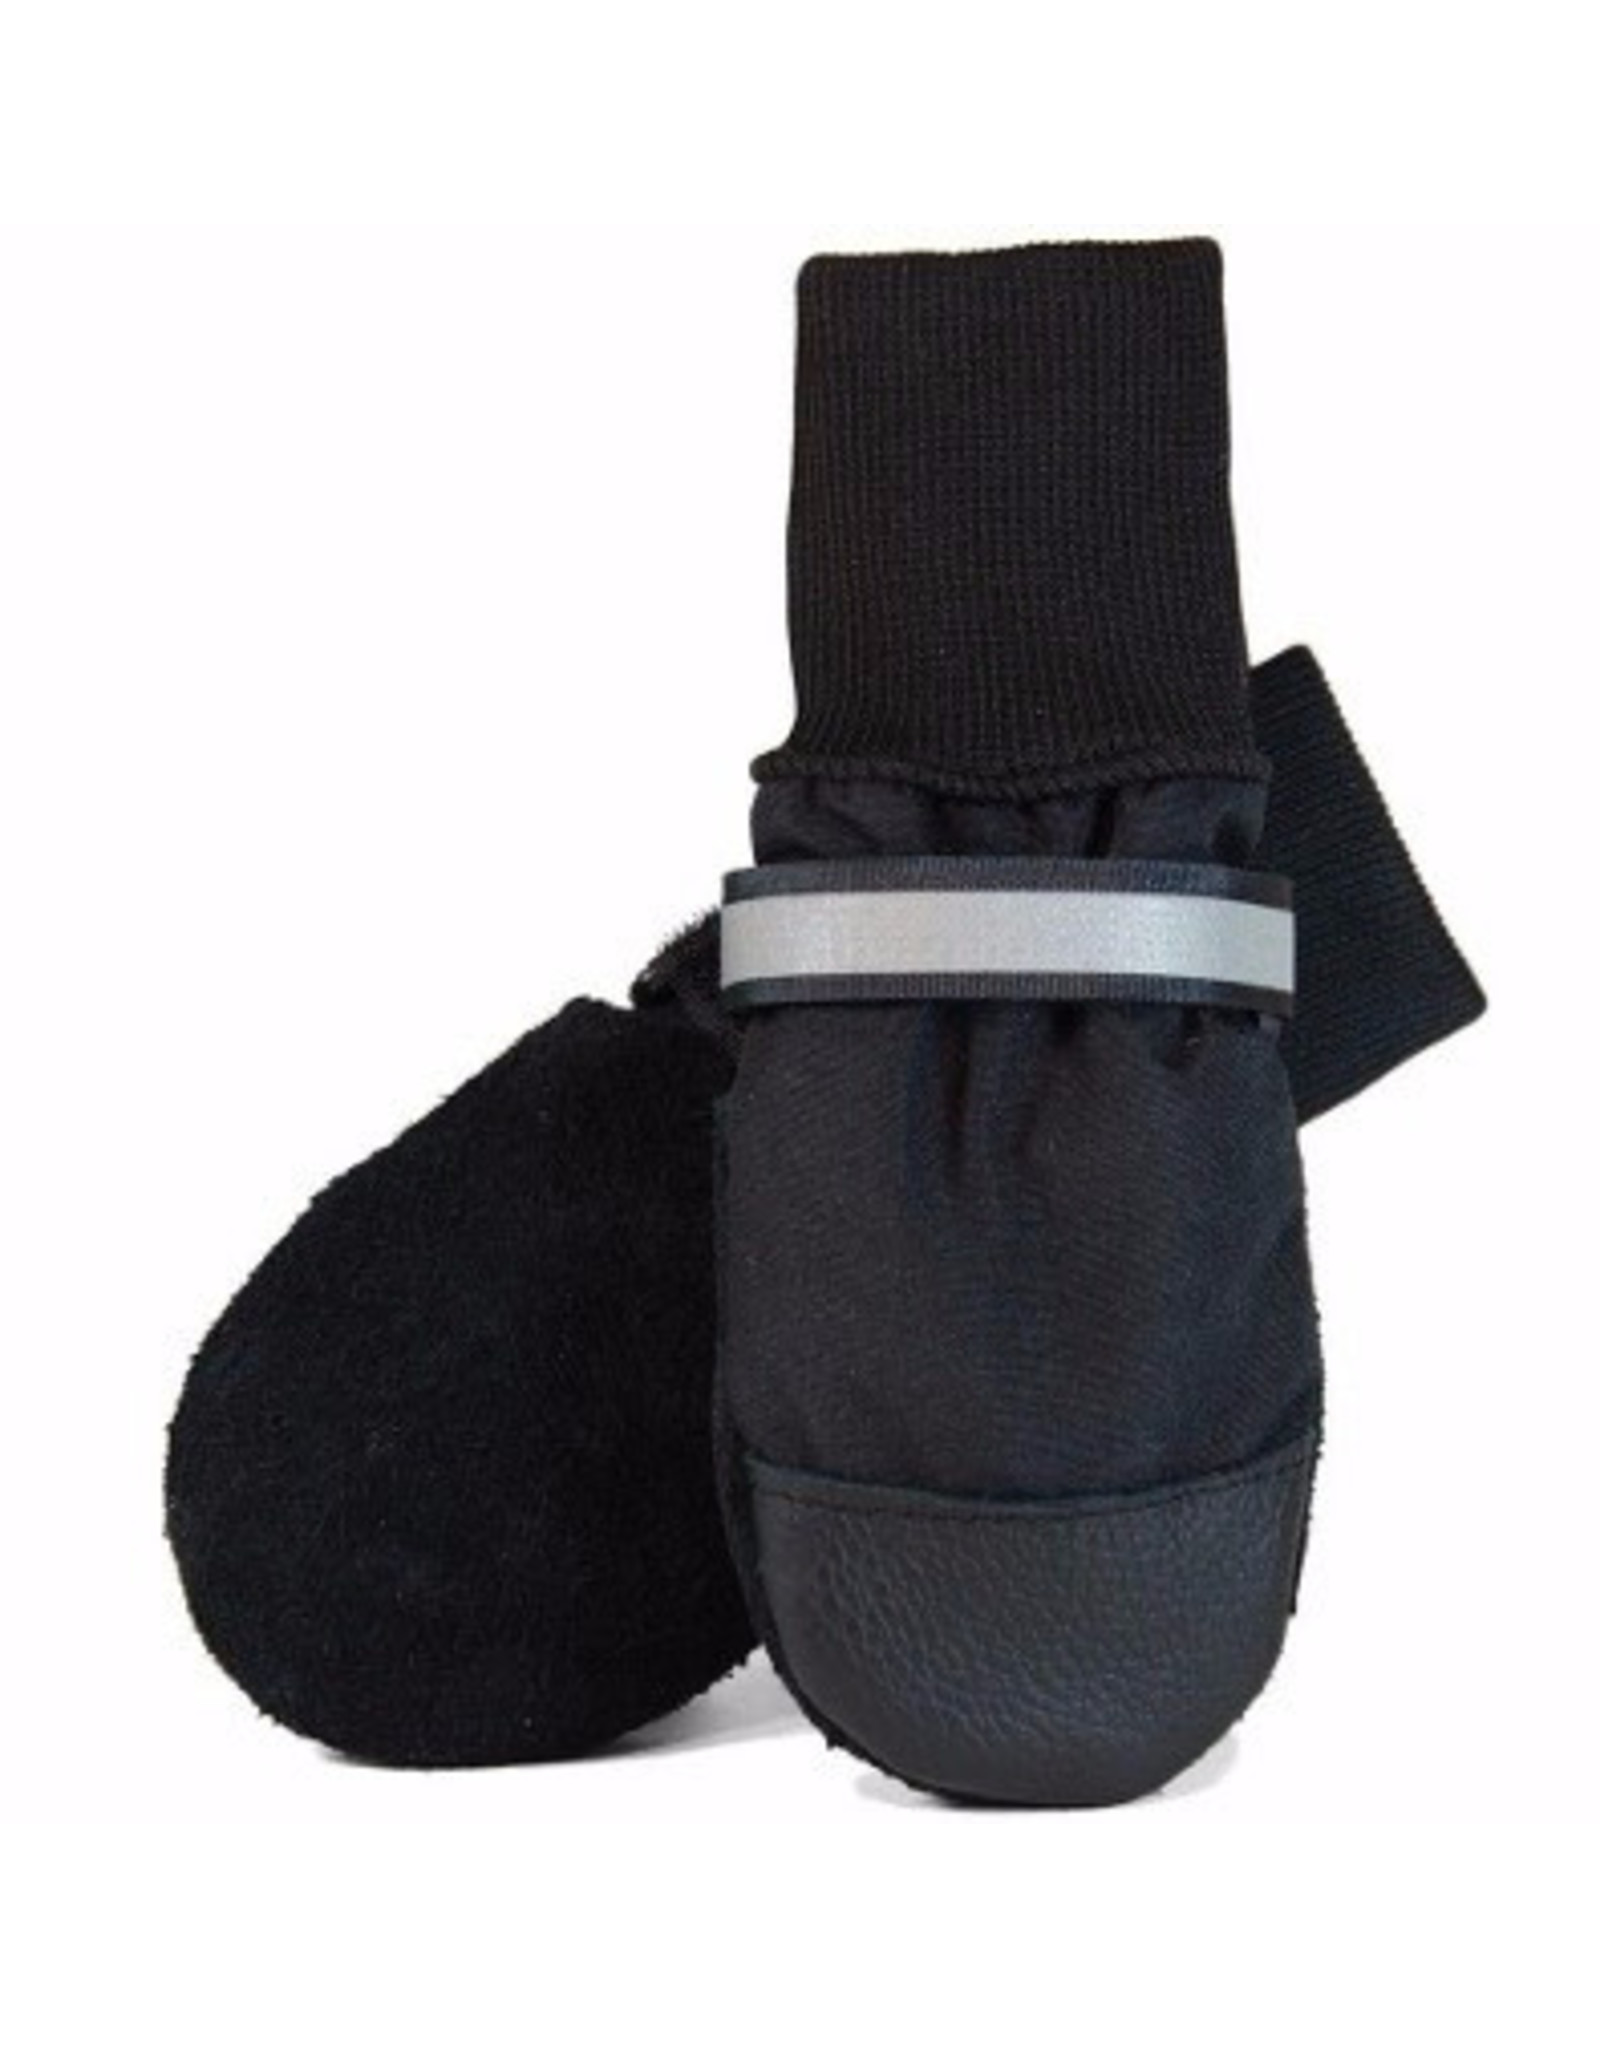 Muttluks Muttluks All-Weather Boots - Black S